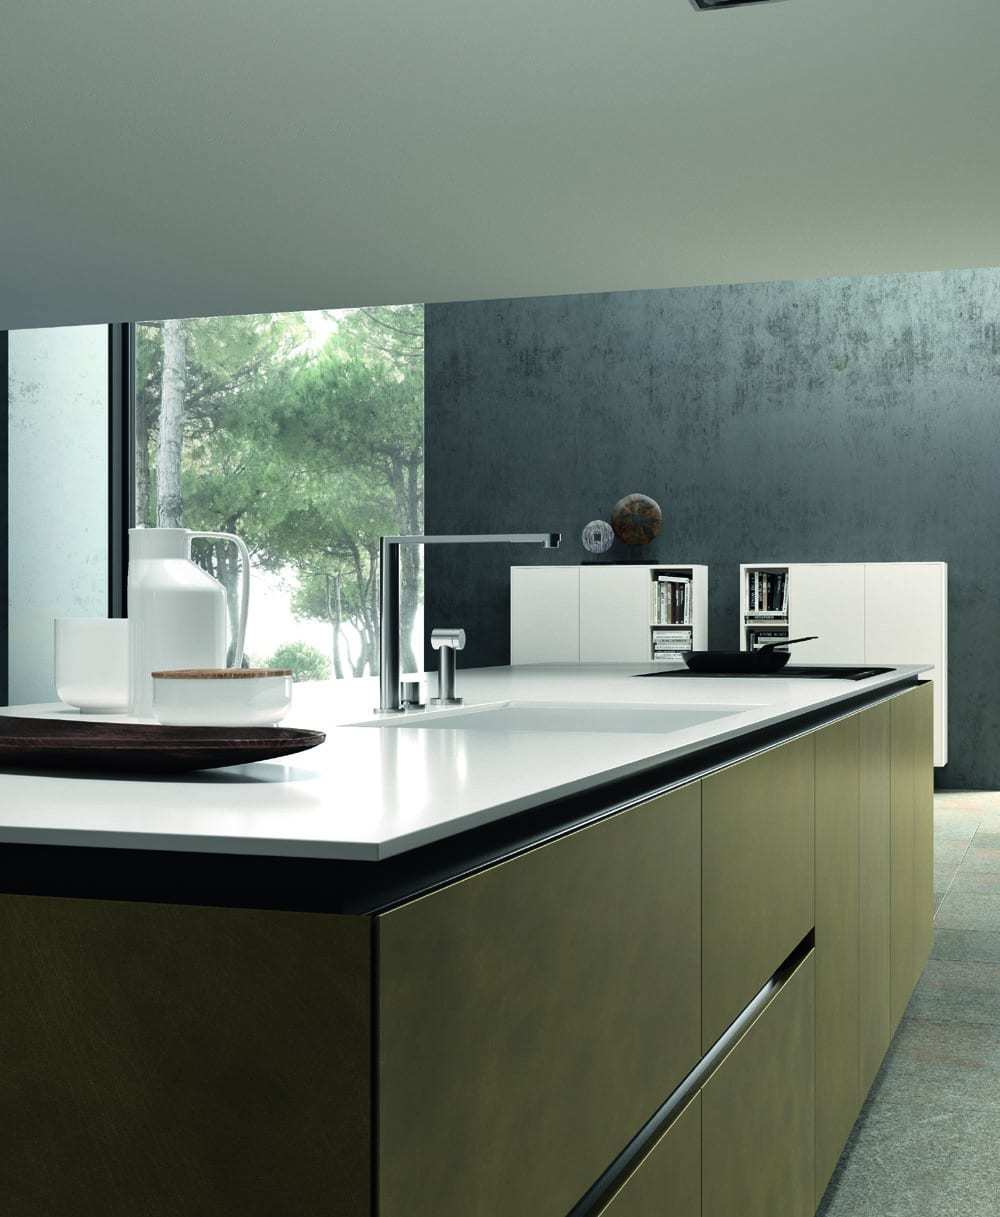 Piano cucina top design miss - Top piano cucina ...